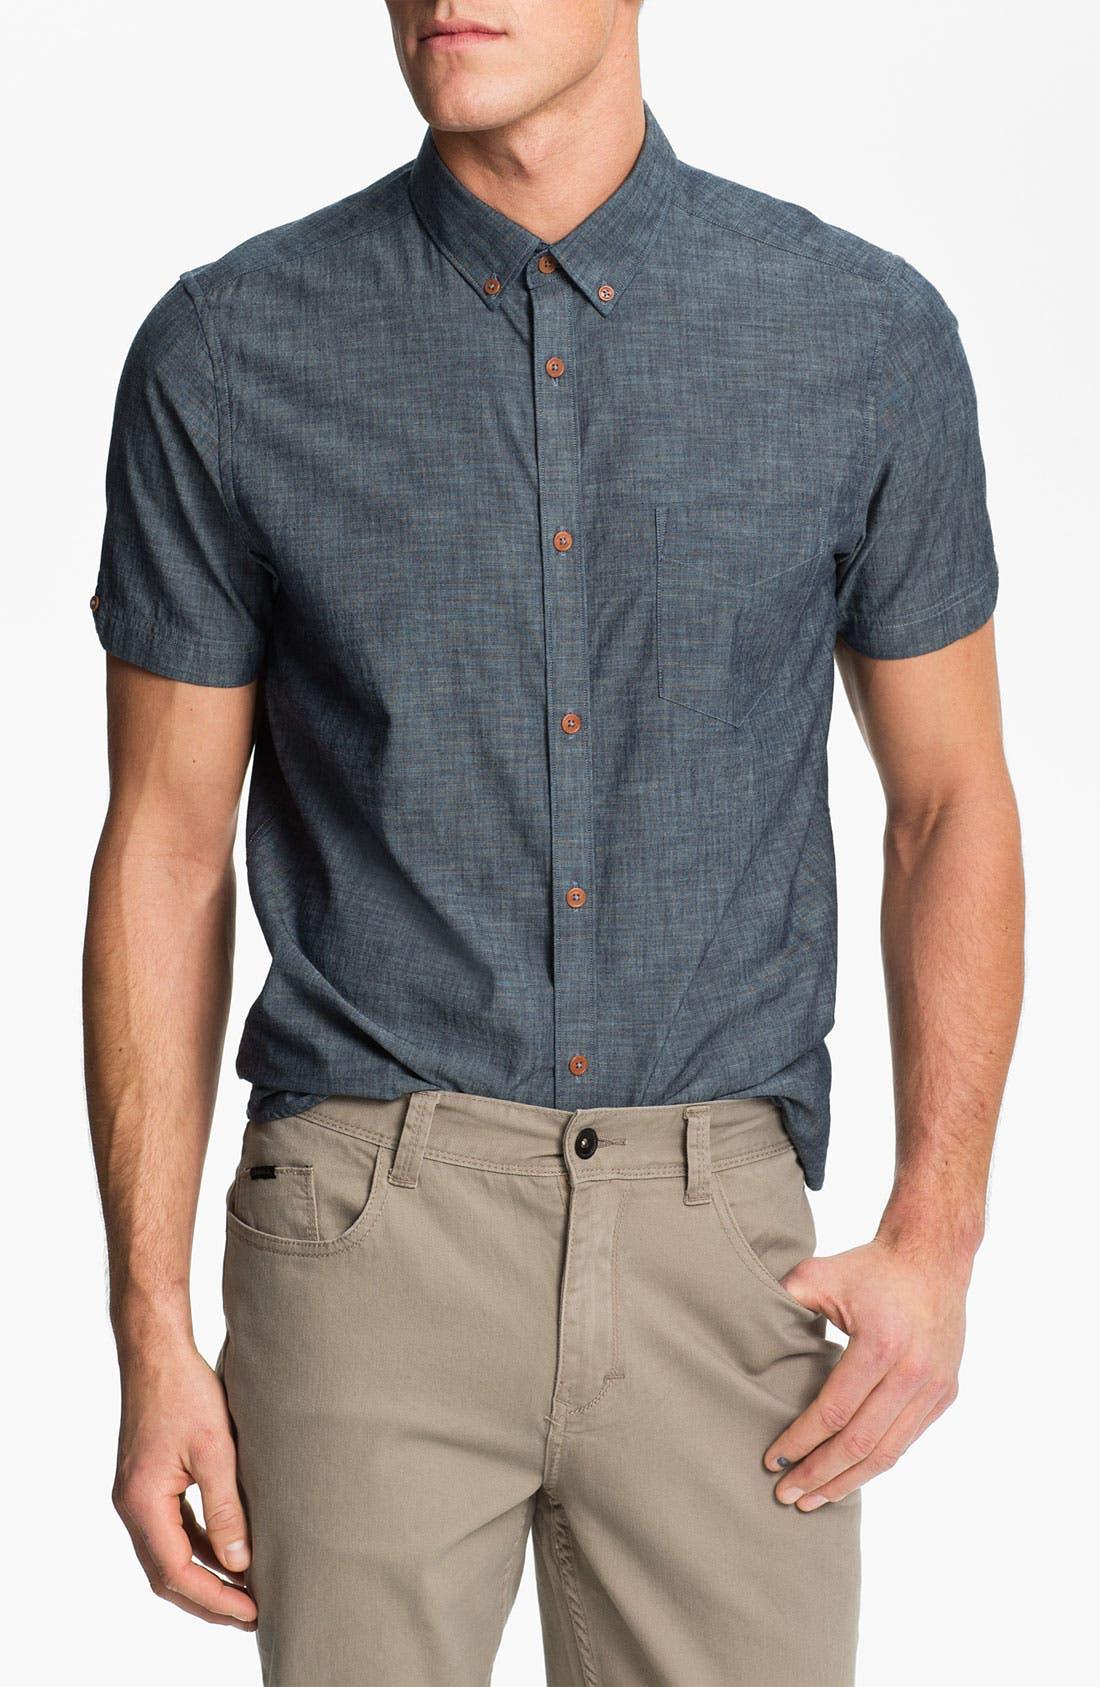 Alternate Image 1 Selected - Ben Sherman Short Sleeve Chambray Shirt